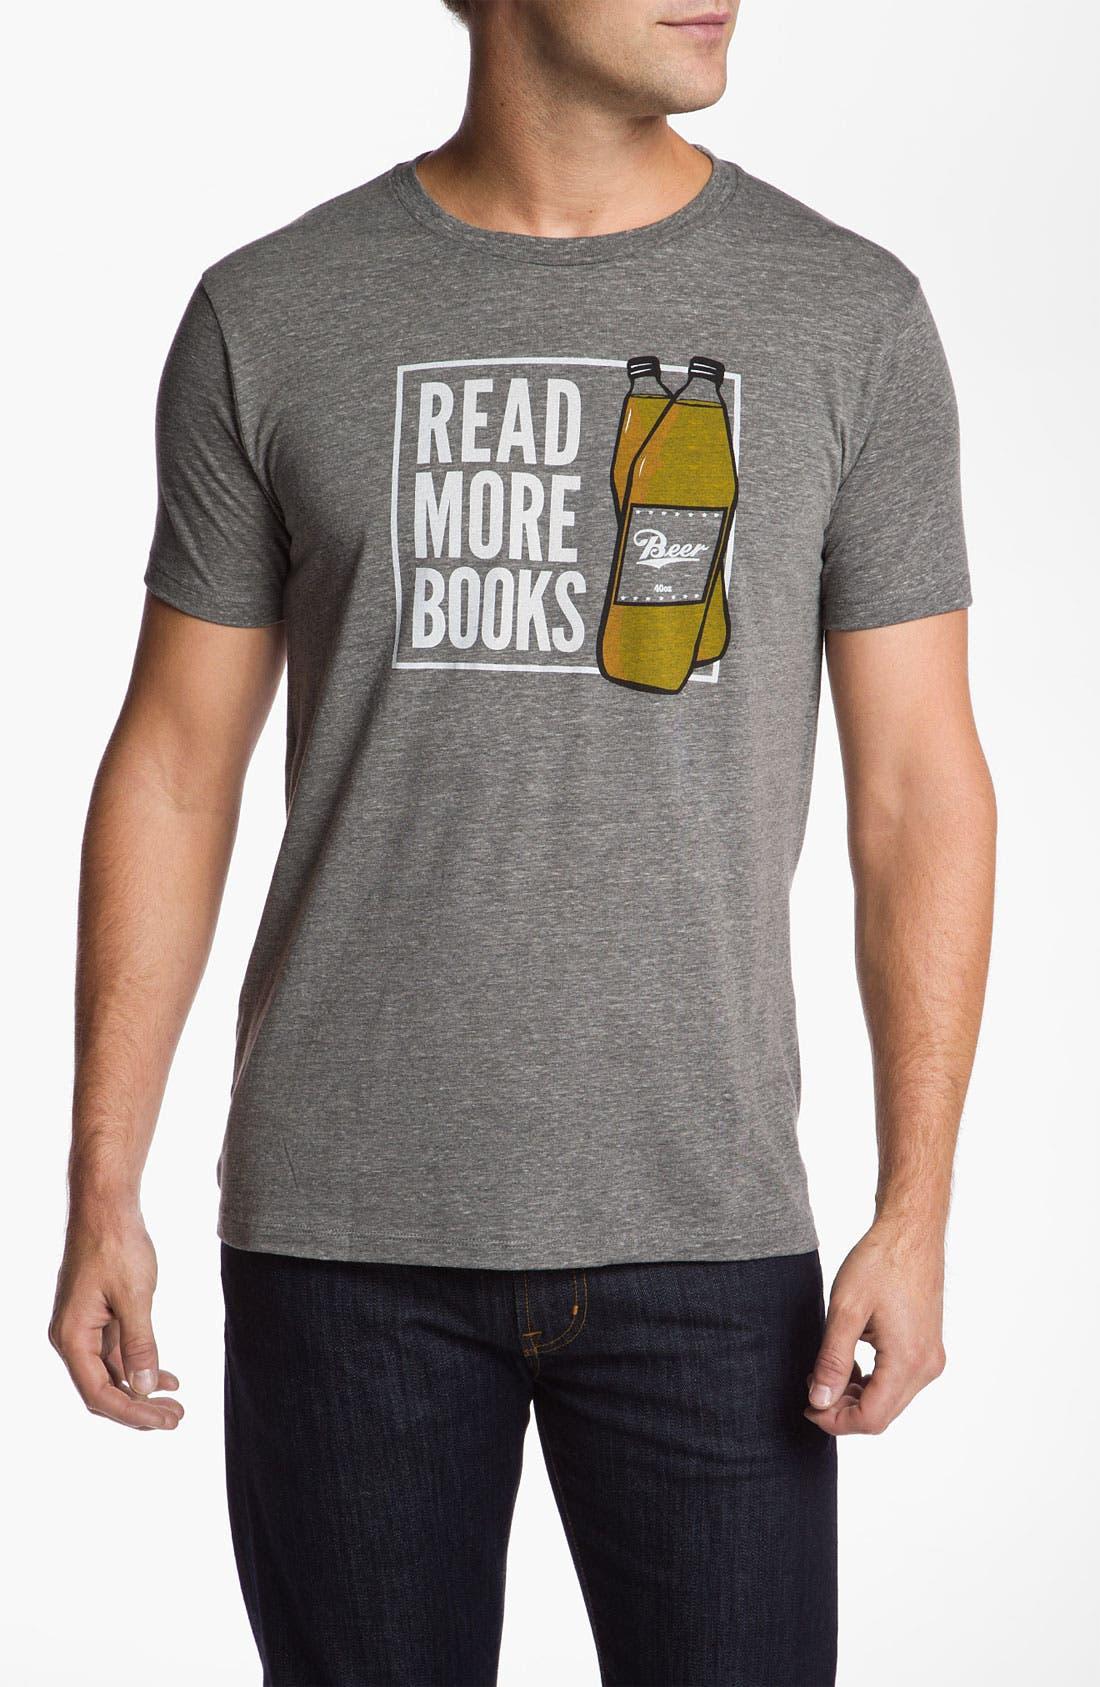 Main Image - Headline Shirts 'Read More Books' Graphic T-Shirt